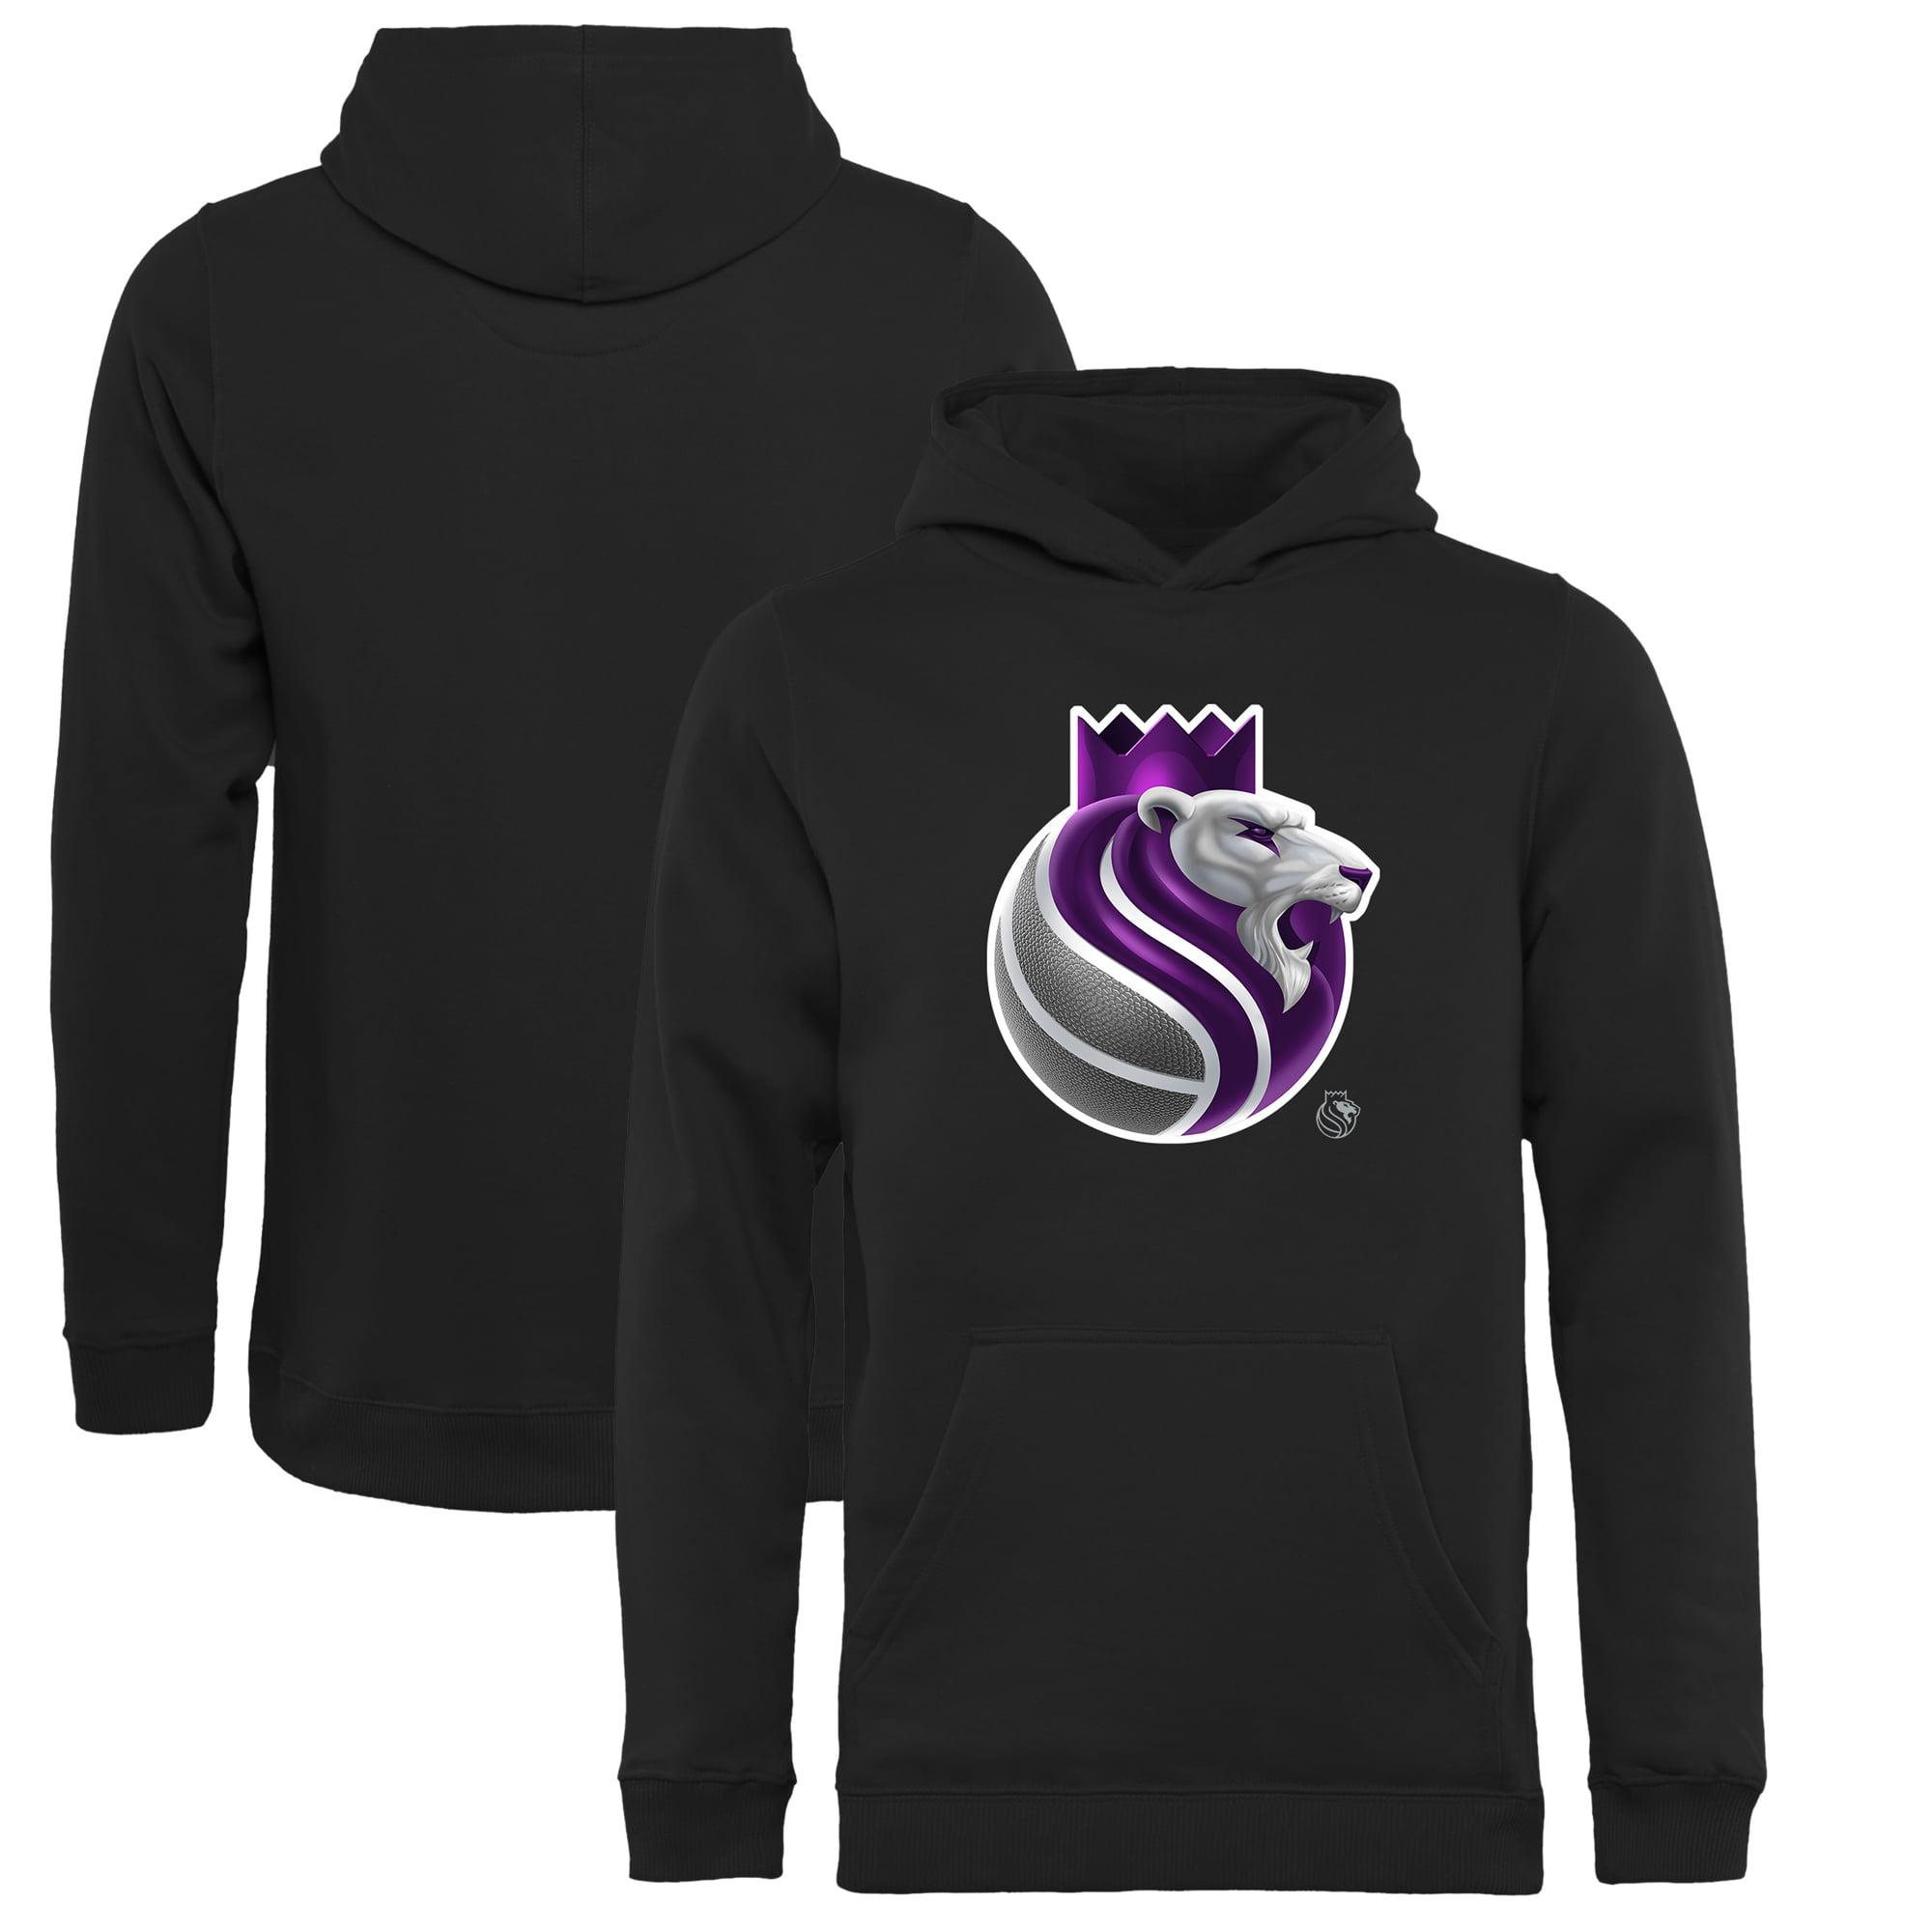 Sacramento Kings Fanatics Branded Youth Midnight Mascot Pullover Hoodie - Black - Yth XL